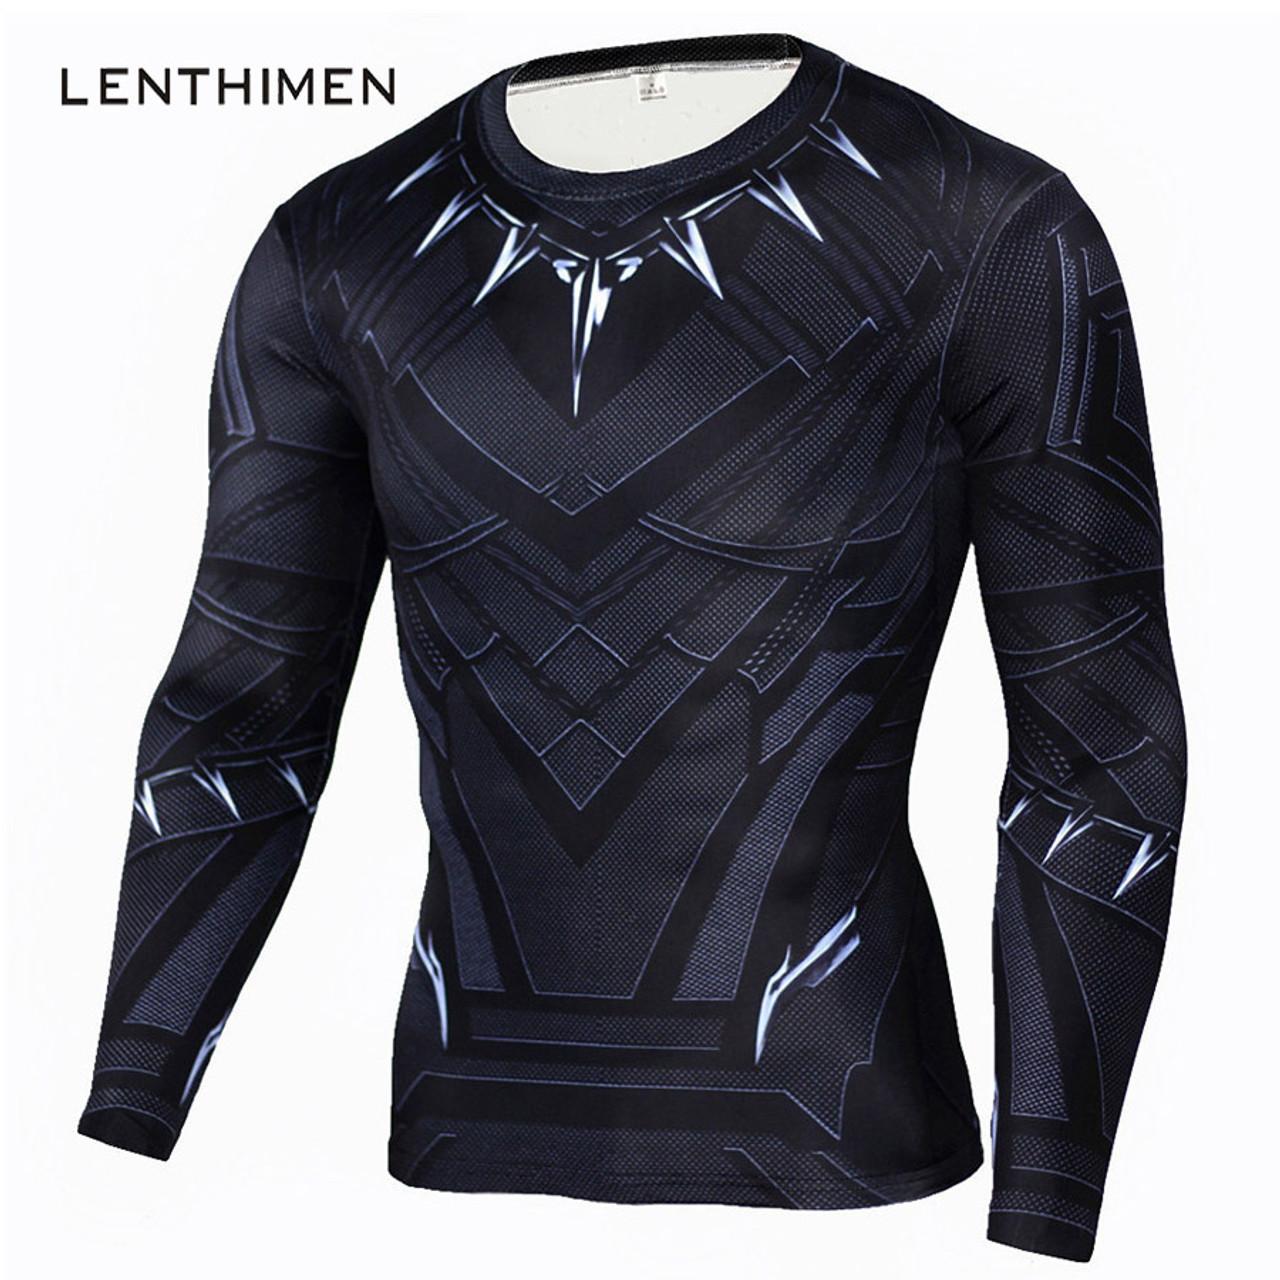 7606f12ebe8 Black Panther T Shirt Men Fitness Compression Shirt Men Superman Captain  America Long Sleeve 3D Marvel ...